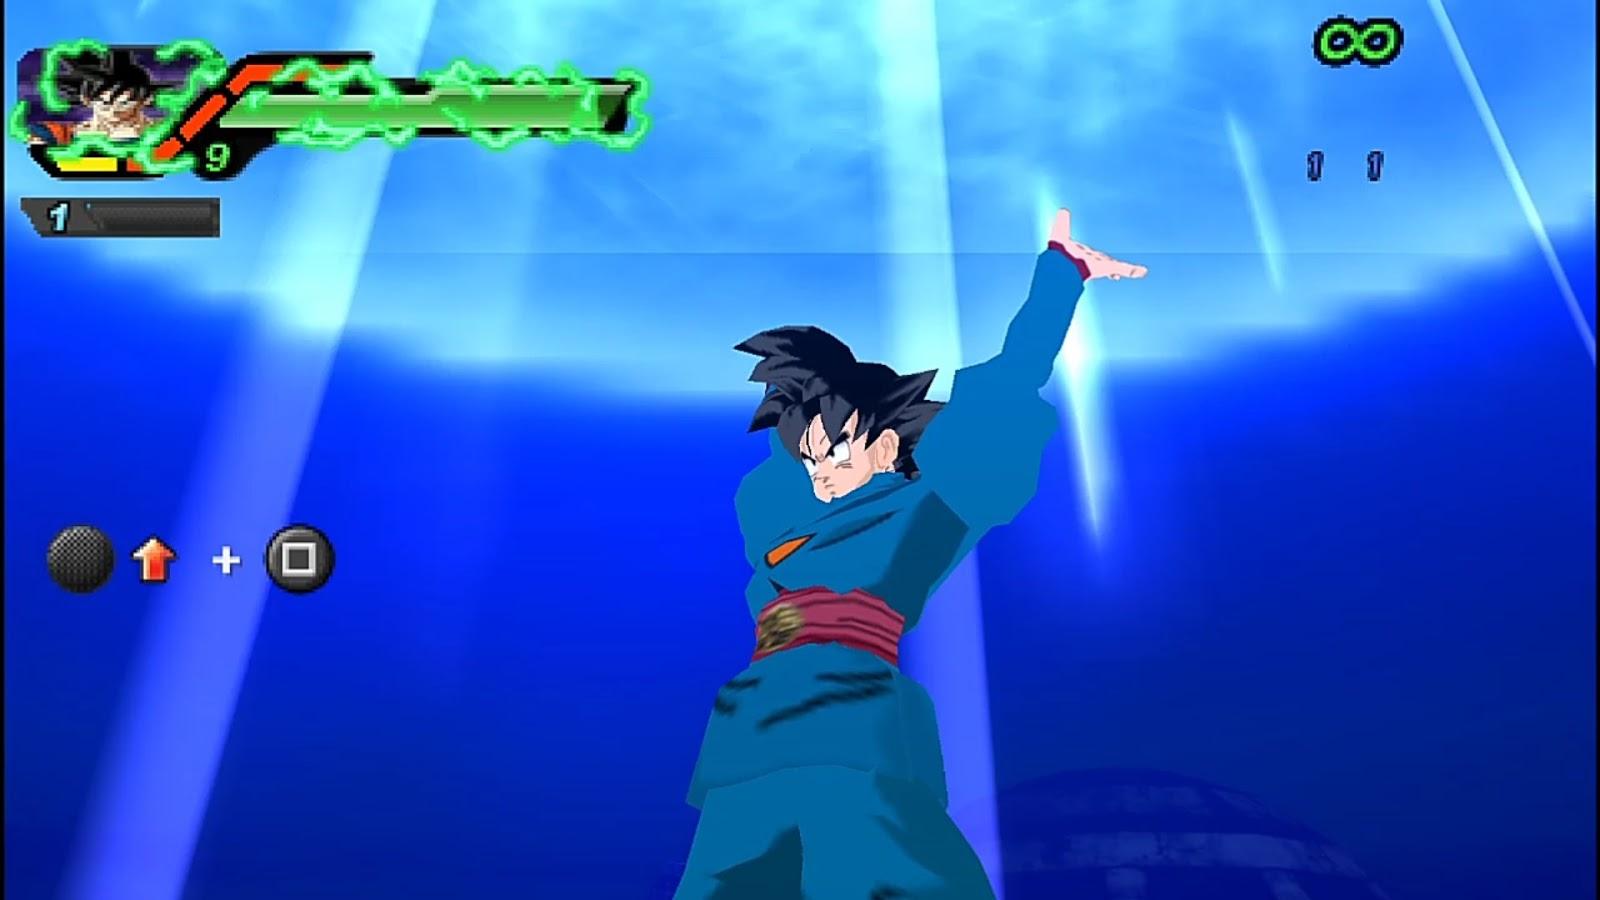 Descargar Ya Dragon Ball BUDOKAI Tenkaichi 3 MOD SUPER +MENU BETA PPSSPP Android (+DOWNLOAD)